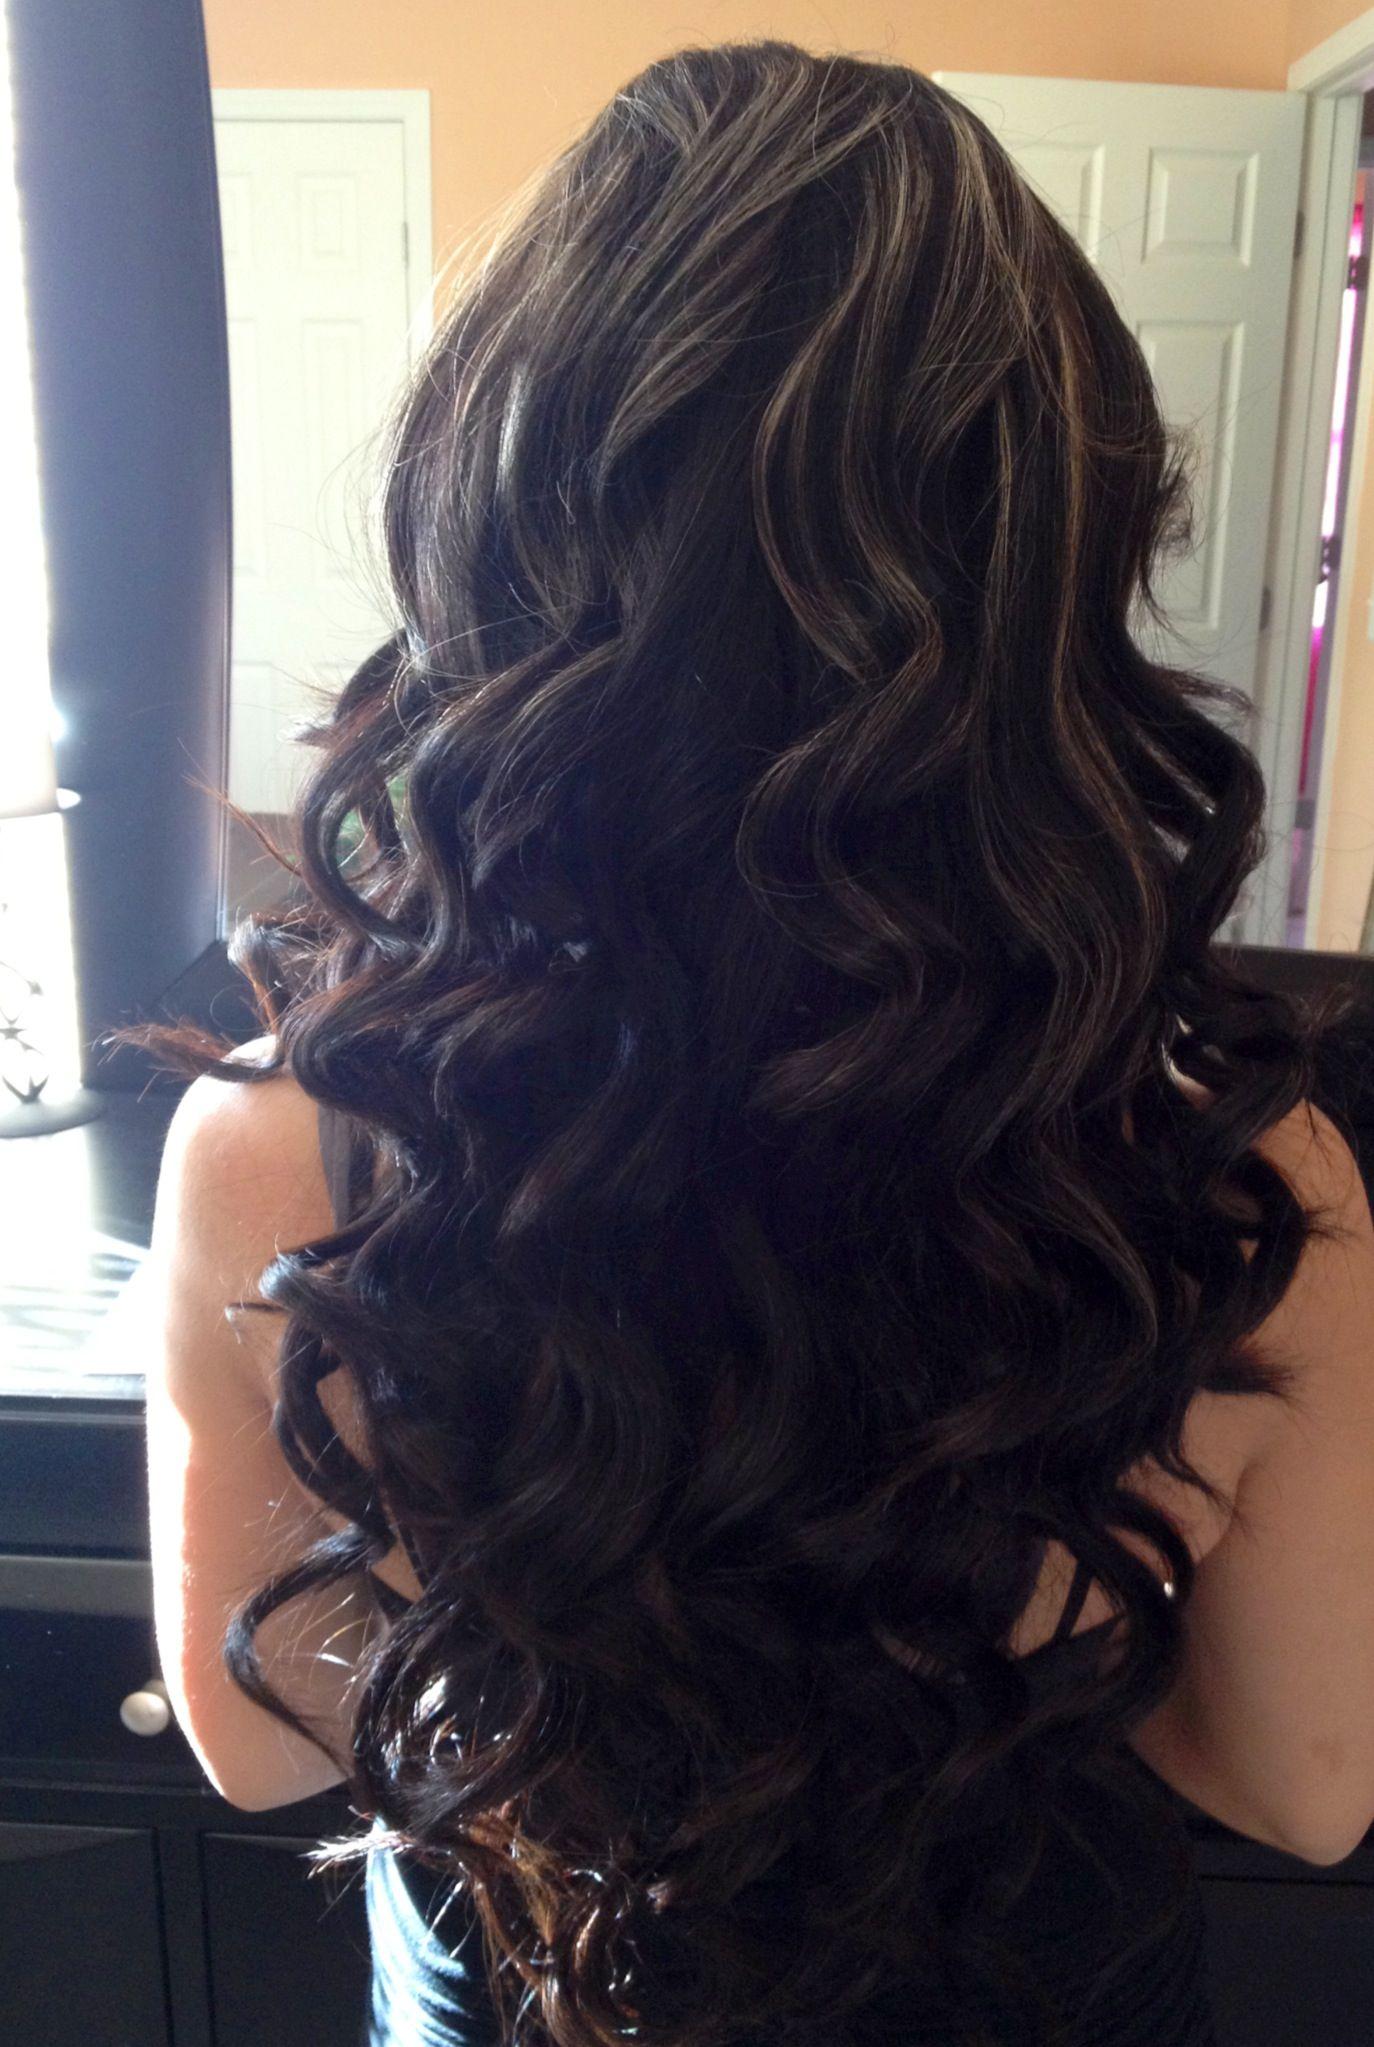 Big curls | hair stuff :) | Pinterest